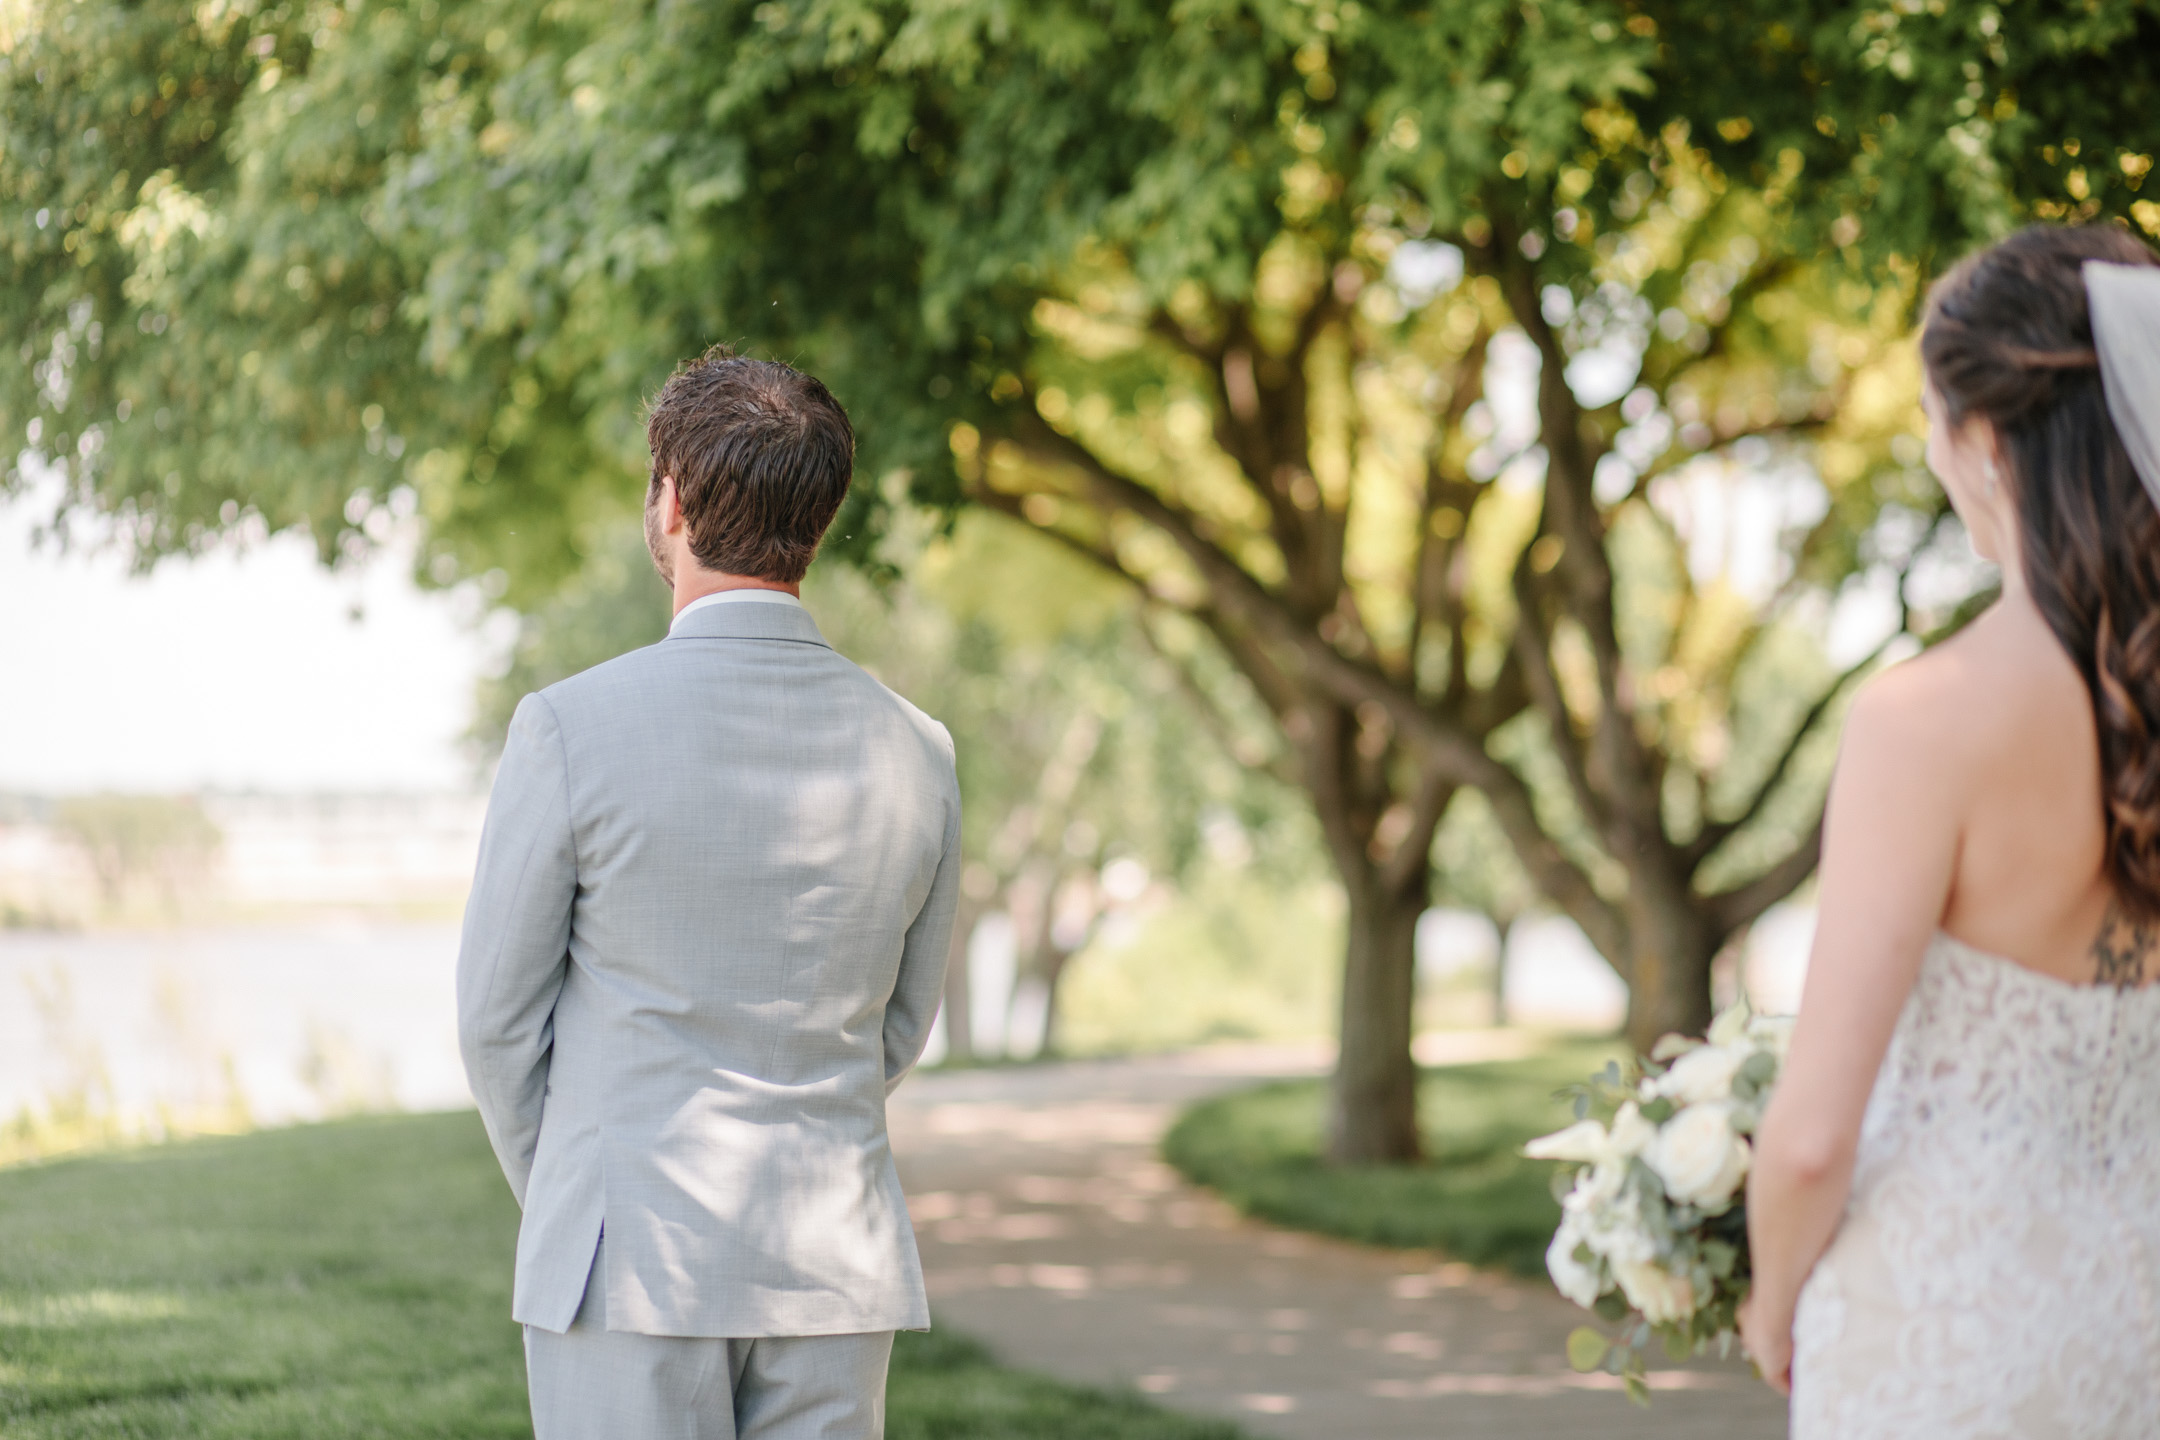 amelia-renee-photography-sioux-city-iowa-wedding-first-look-02.jpg